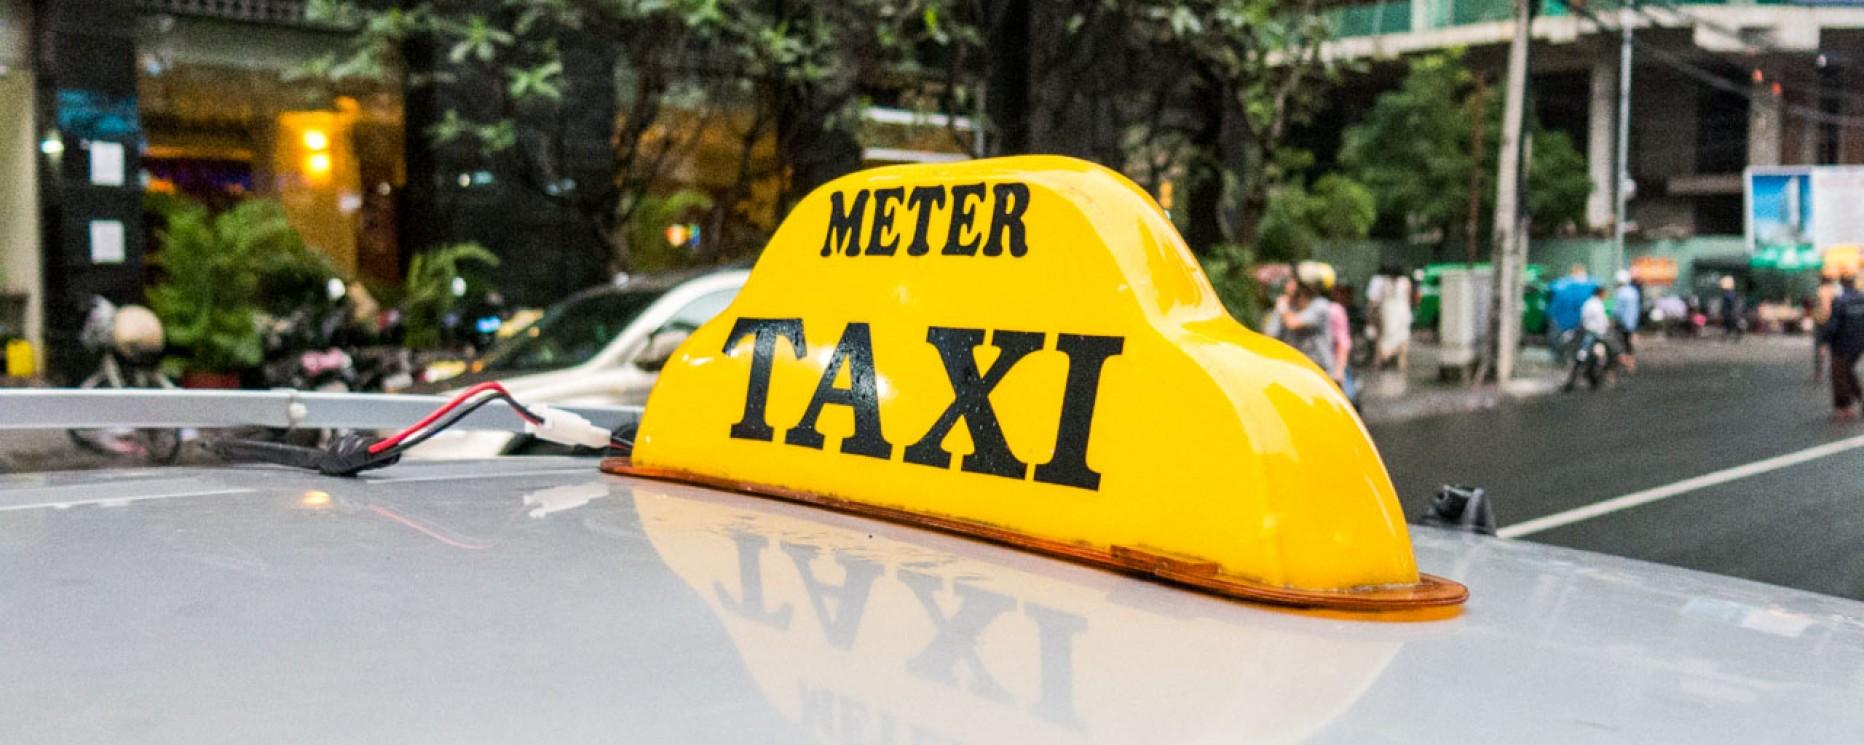 Nos amis les taxis